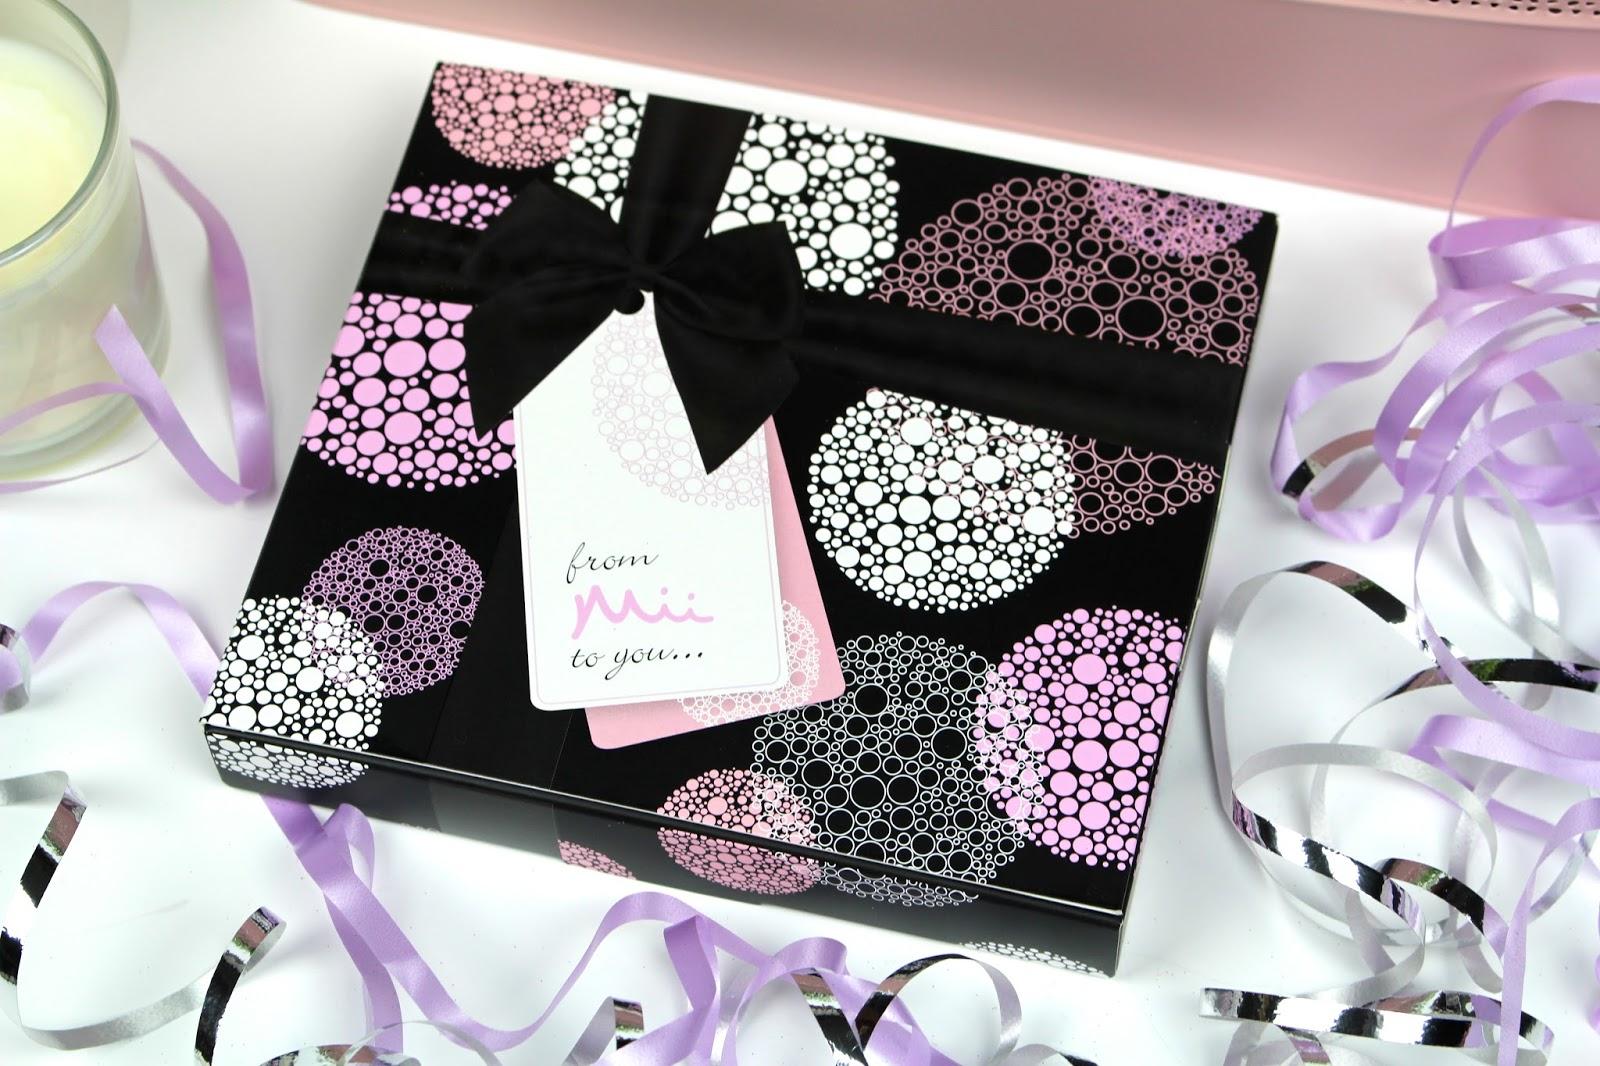 Mii Cosmetics Giveaway Prize Christmas 2015